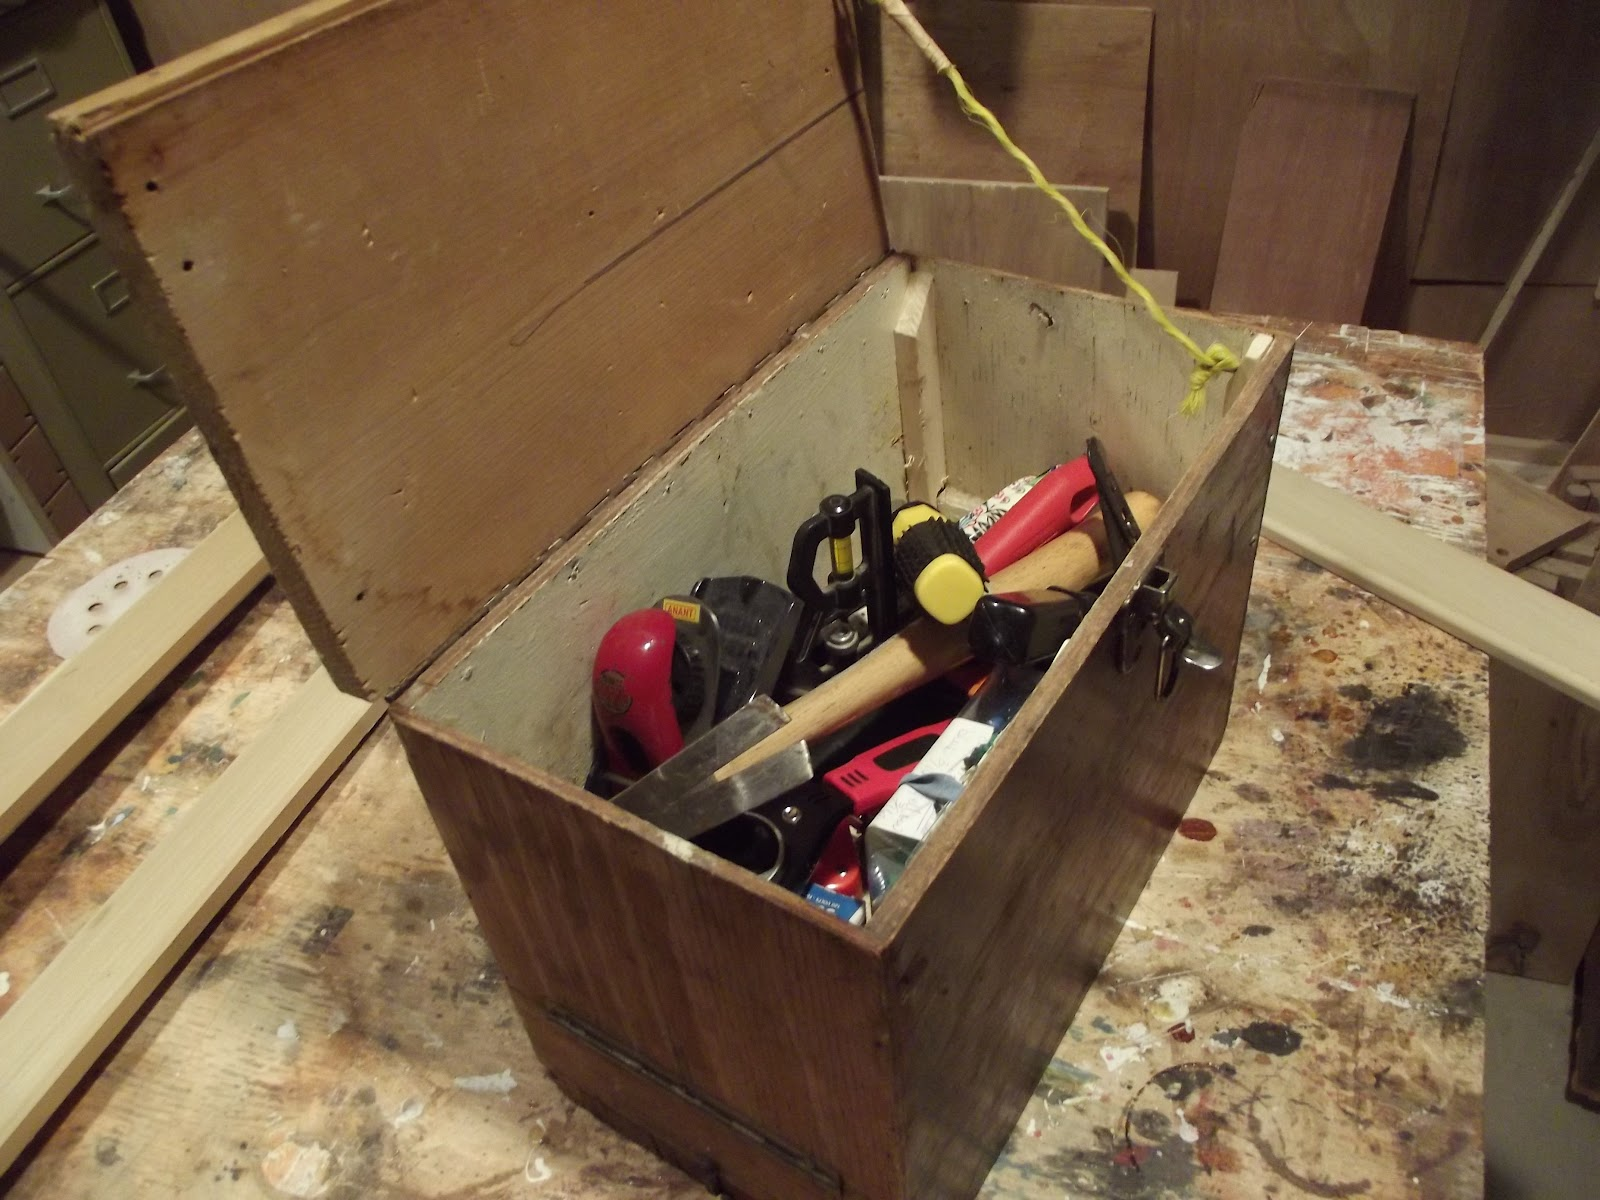 THE TOOL STORE BLOG: Apartment Tool Kit